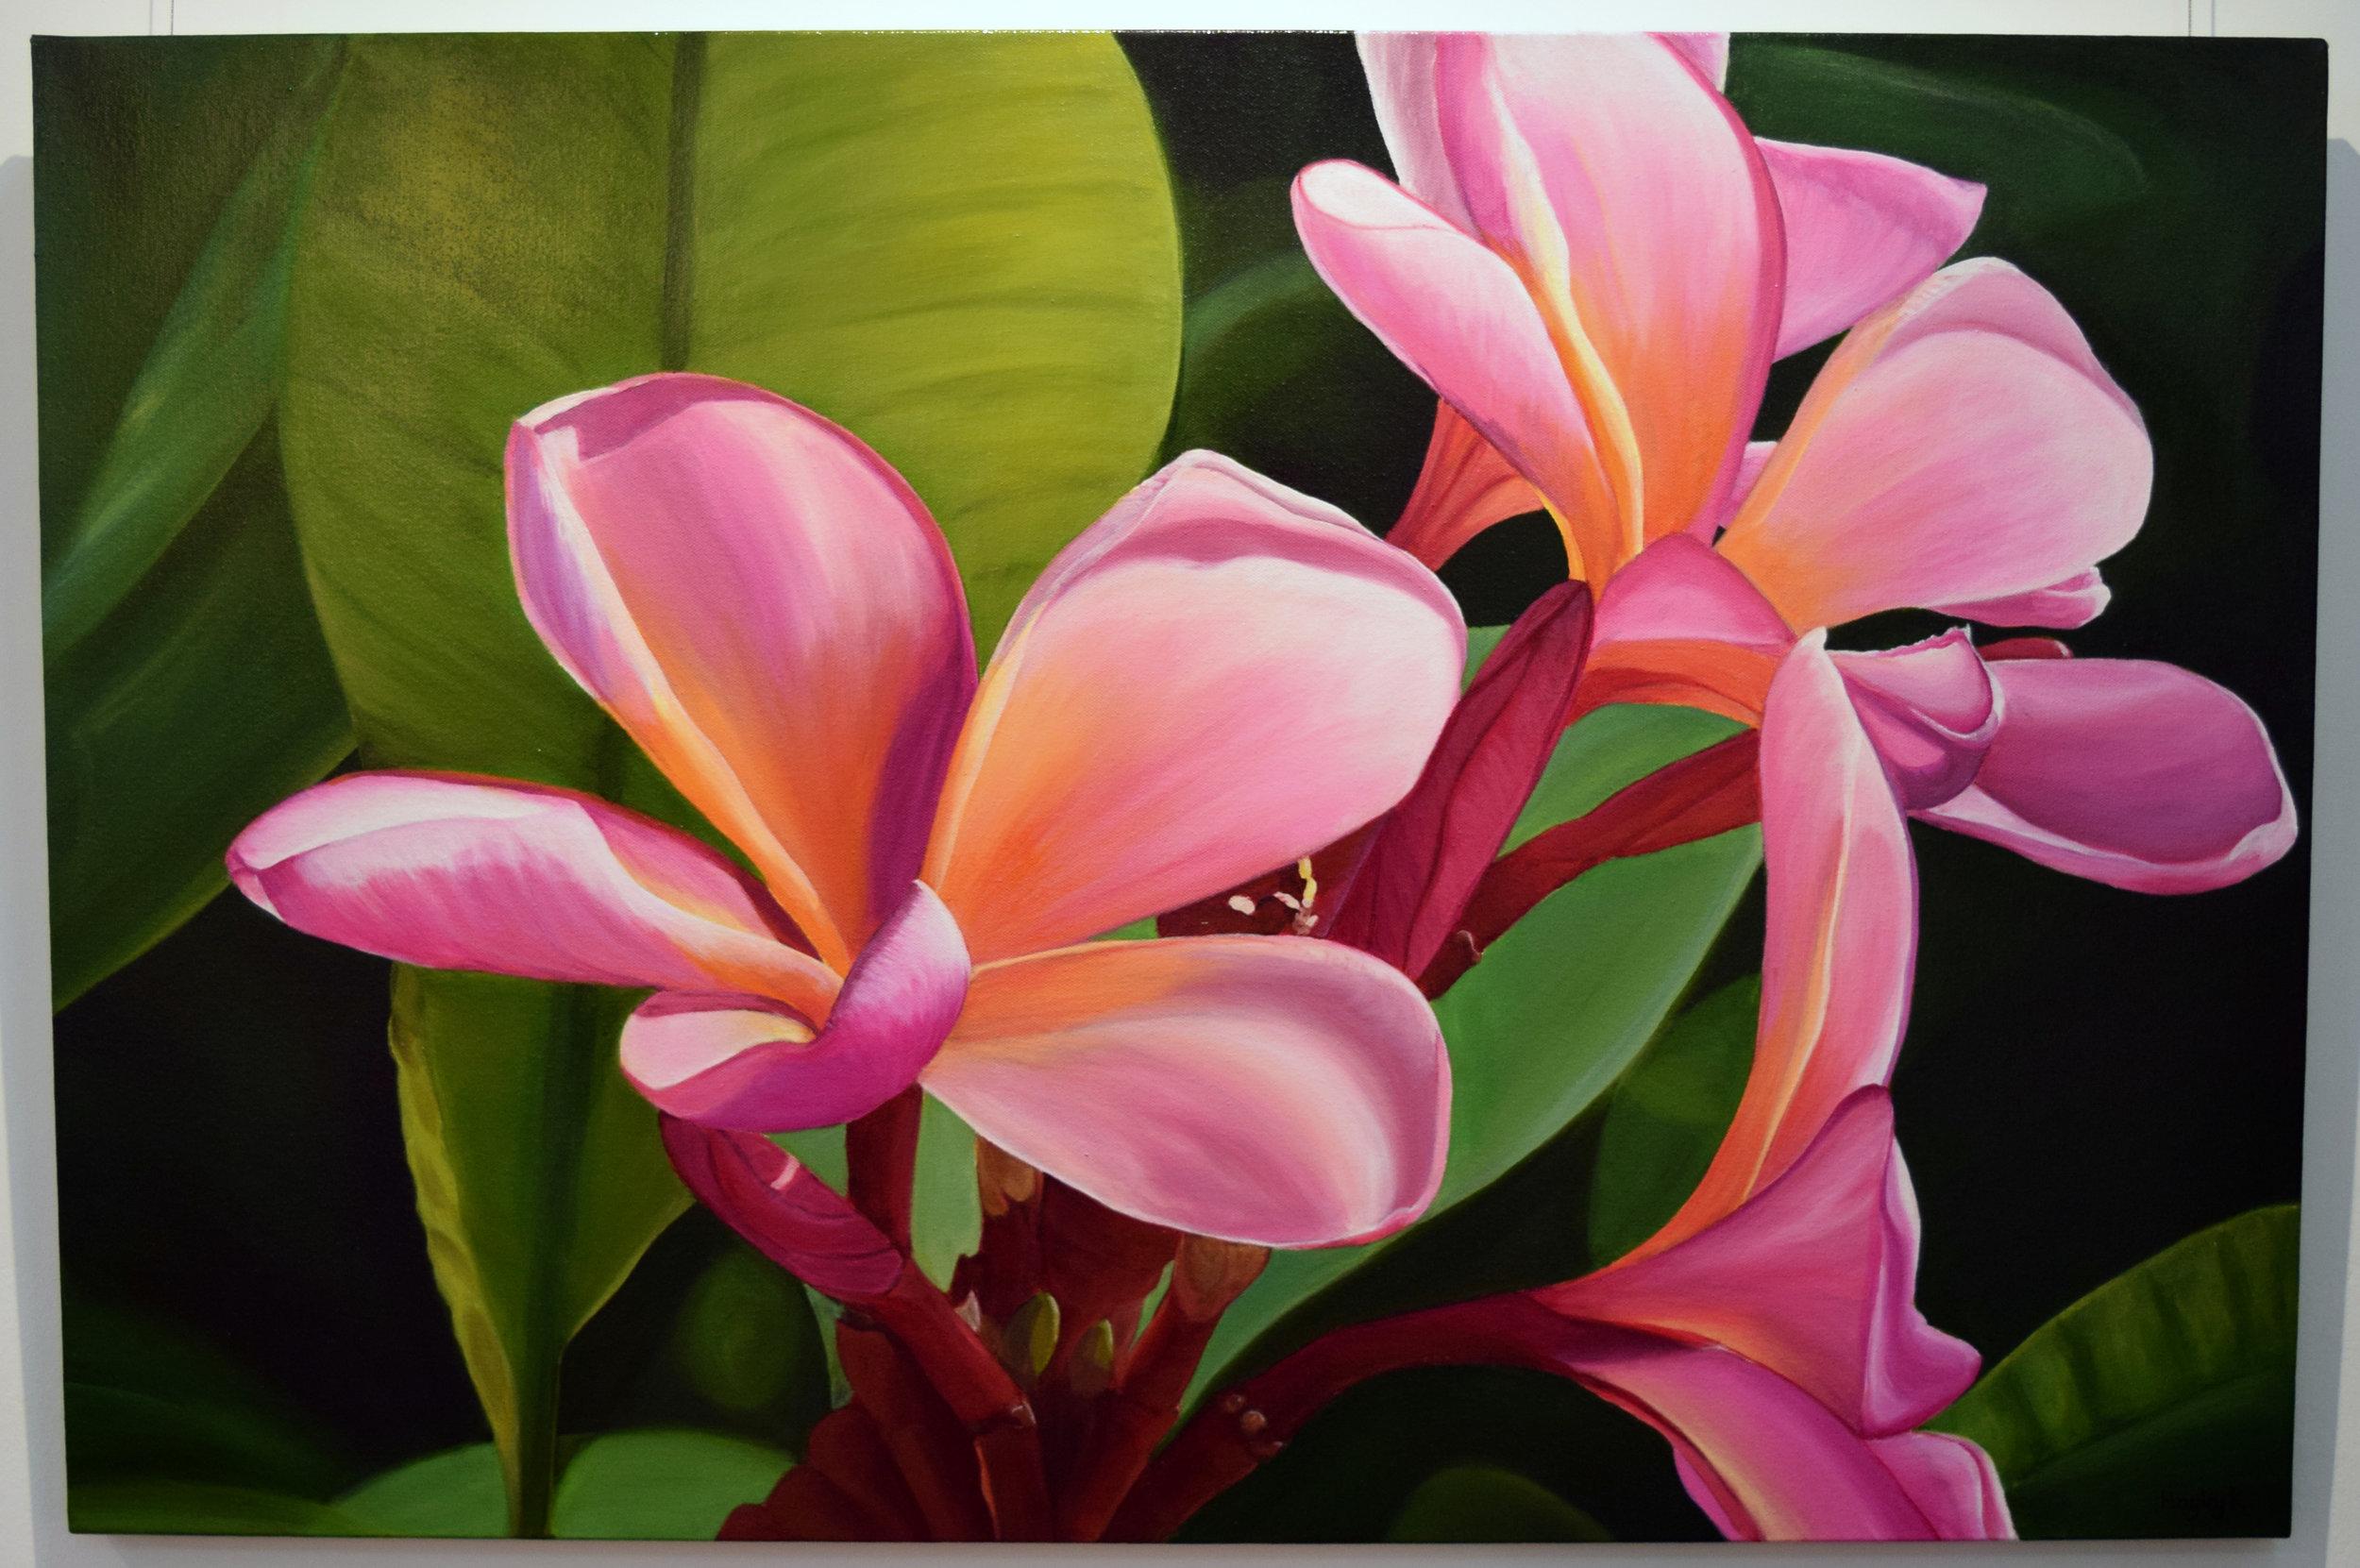 1. Hayley Krüger Gradwell, Pink Splash, 2018, acrylic on canvas, 61 x 91 cm, $850